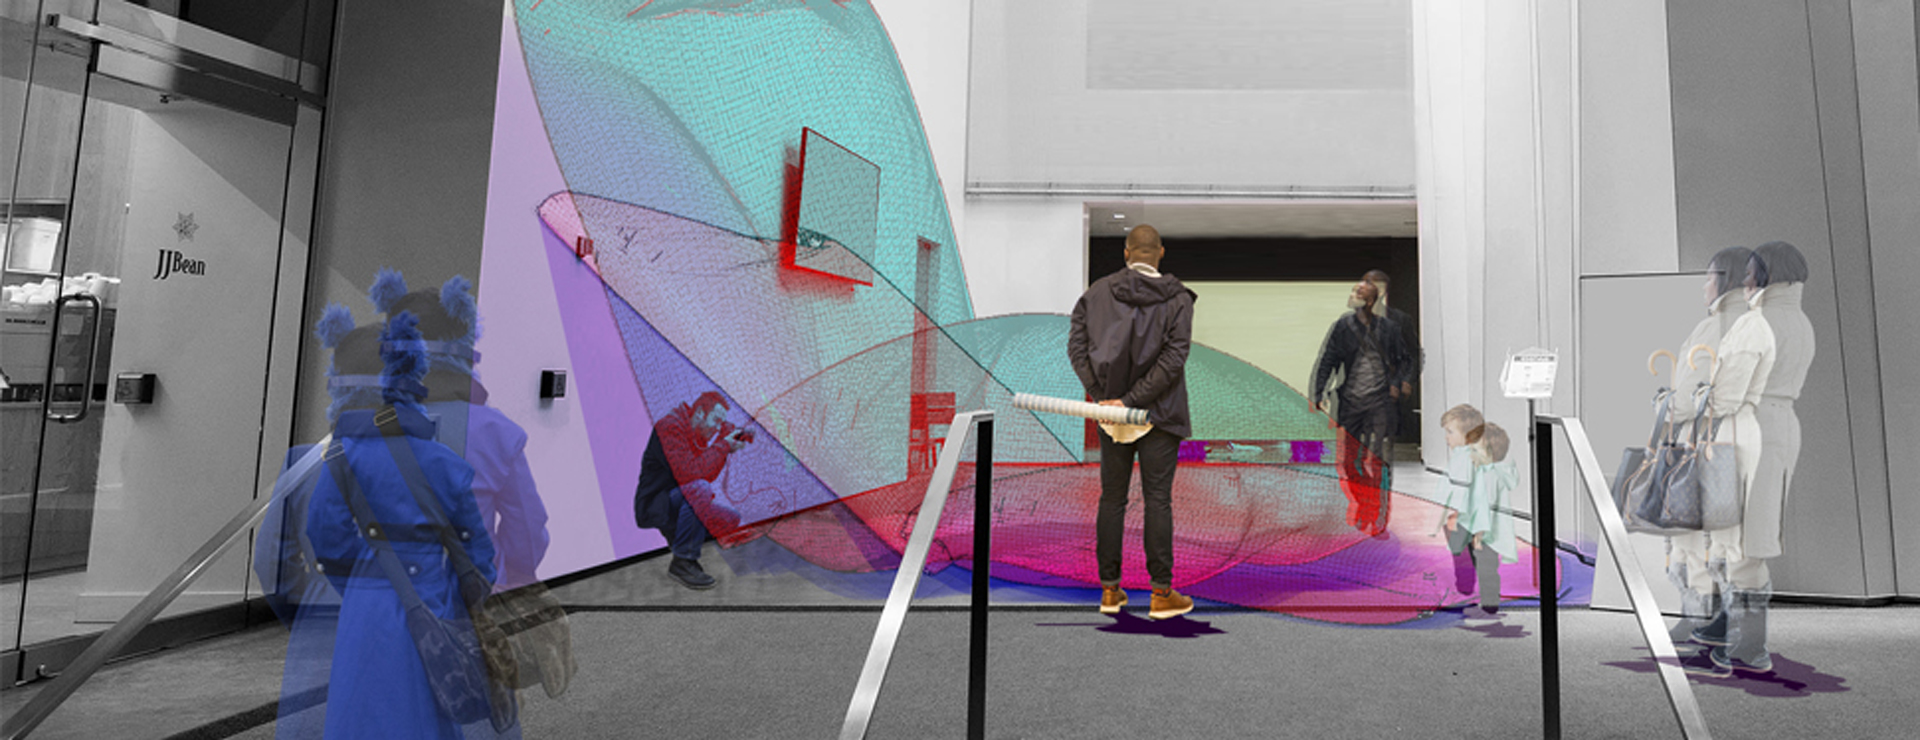 DesignTO Tours: Exploring Art at Yonge + St. Clair